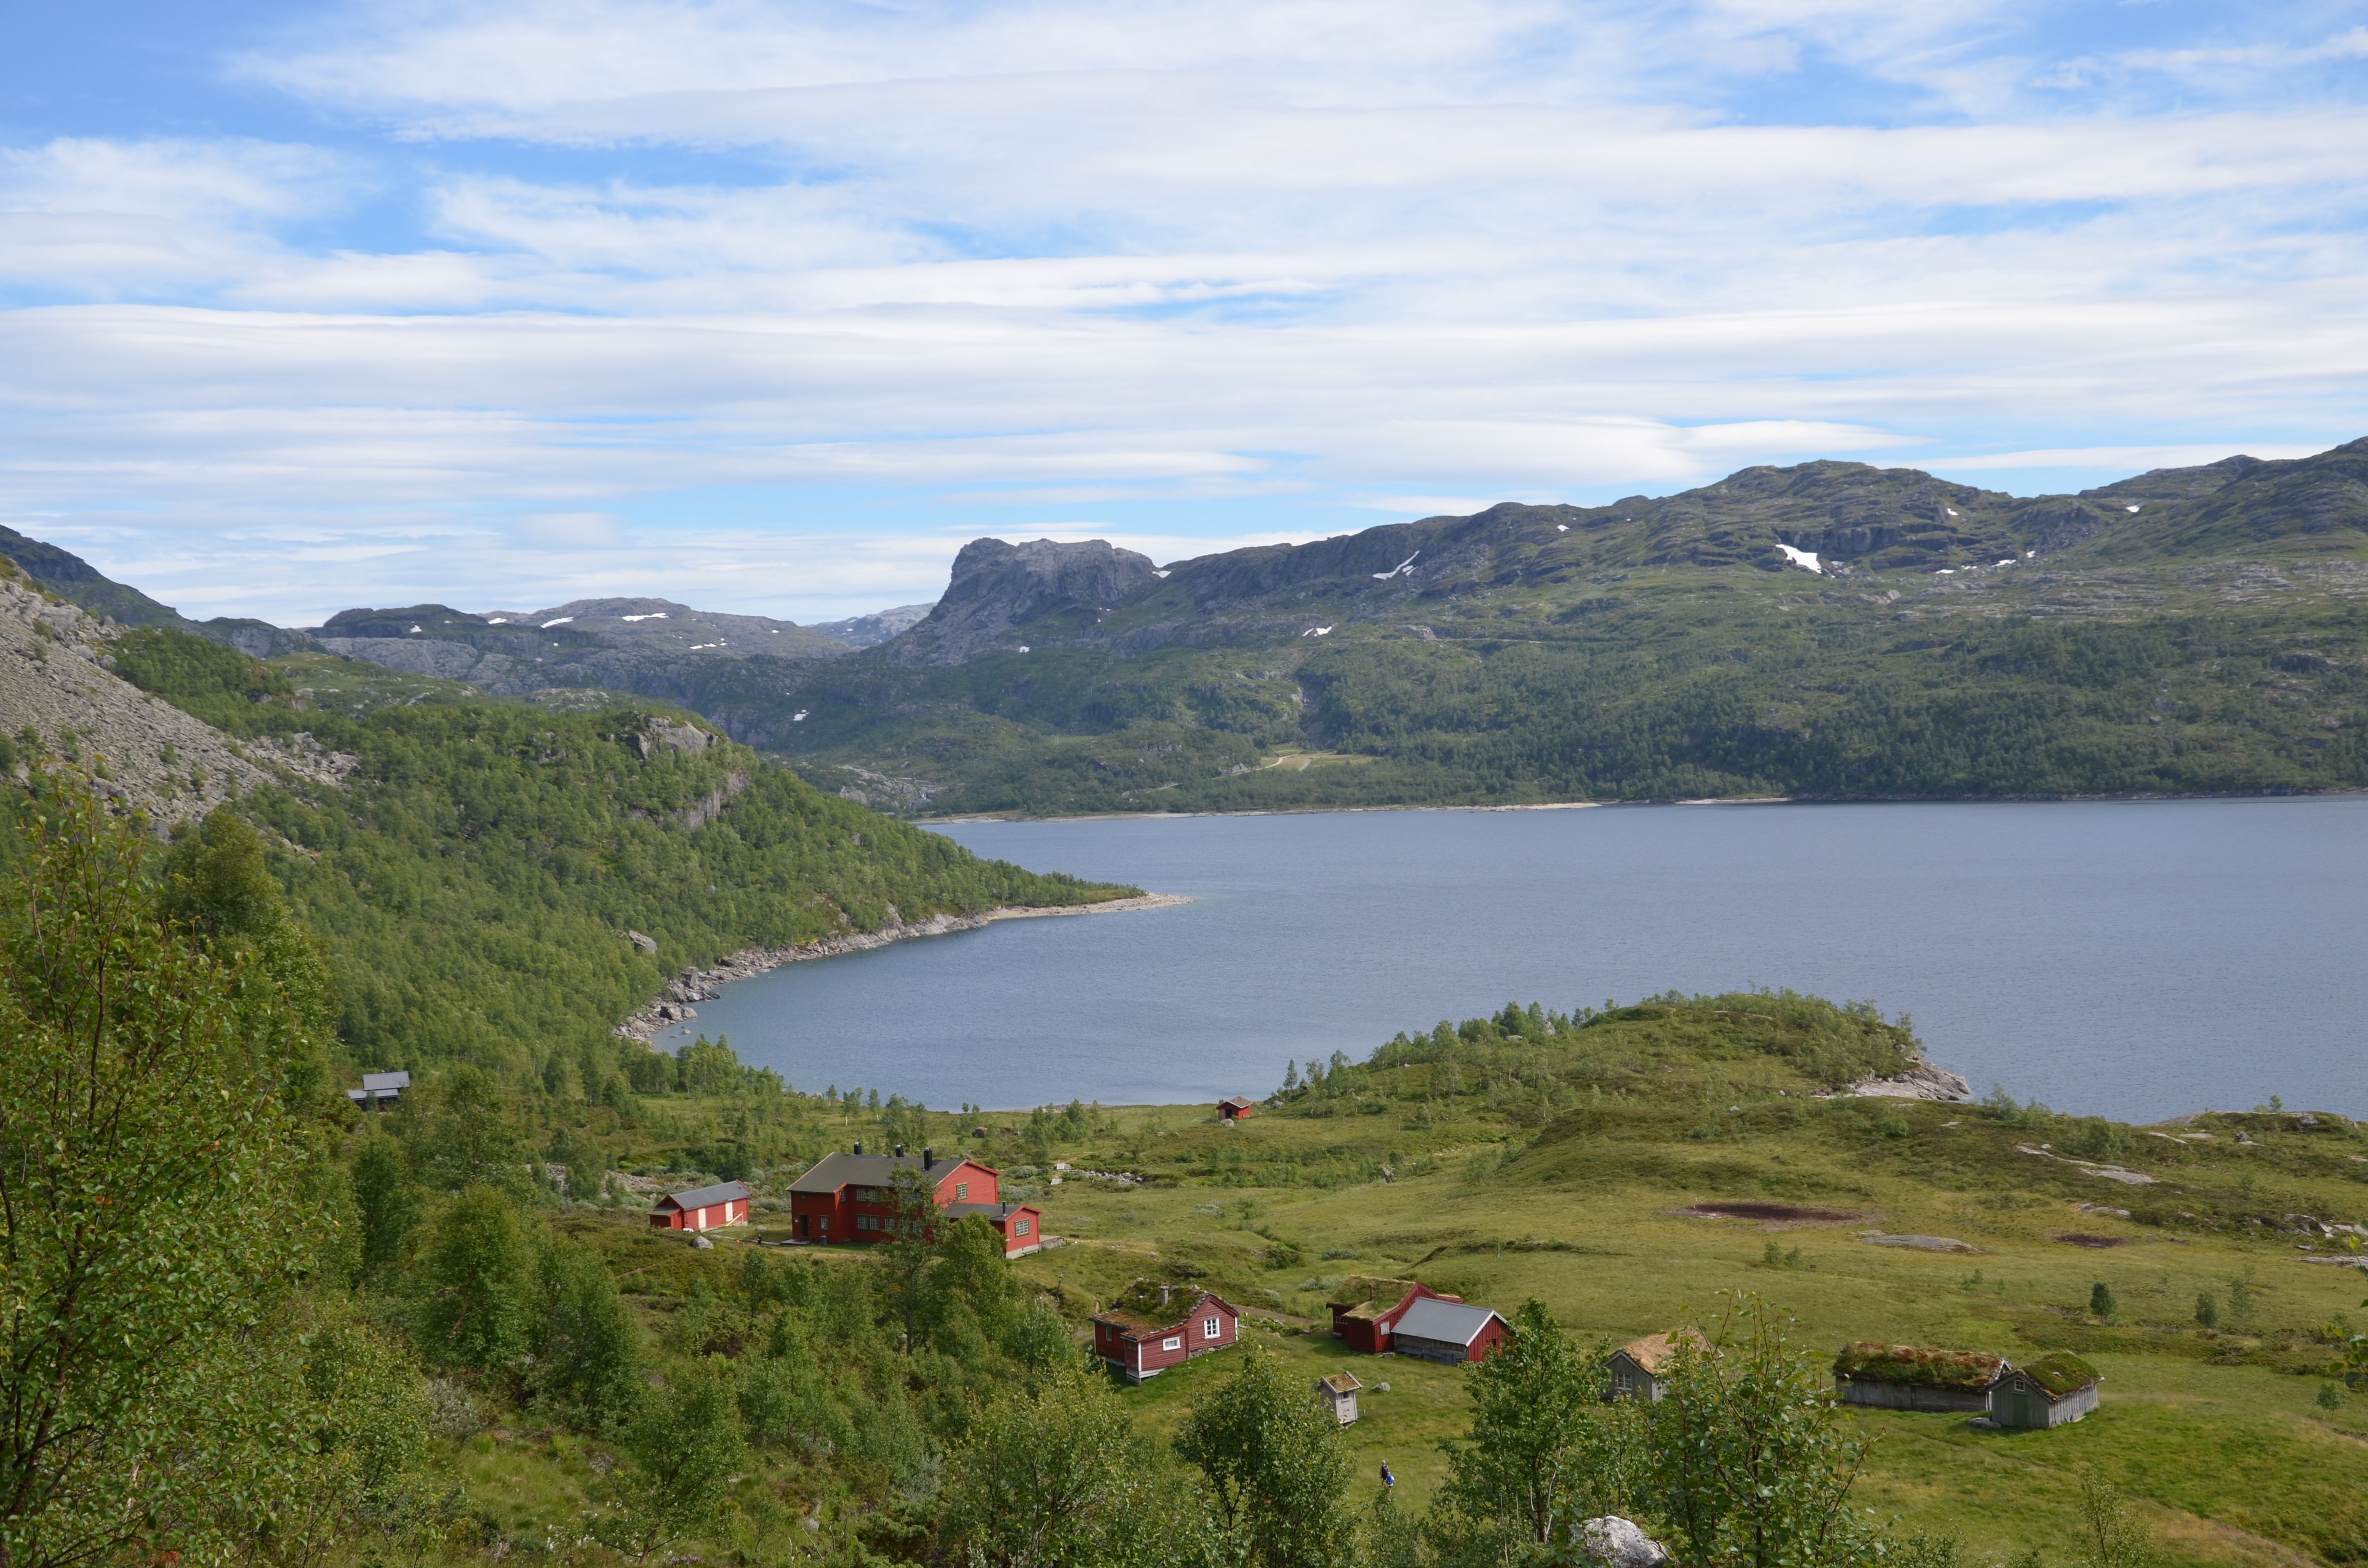 Fugleperspektivbilete av villmarksleik på Sandsa sumaren 2018.